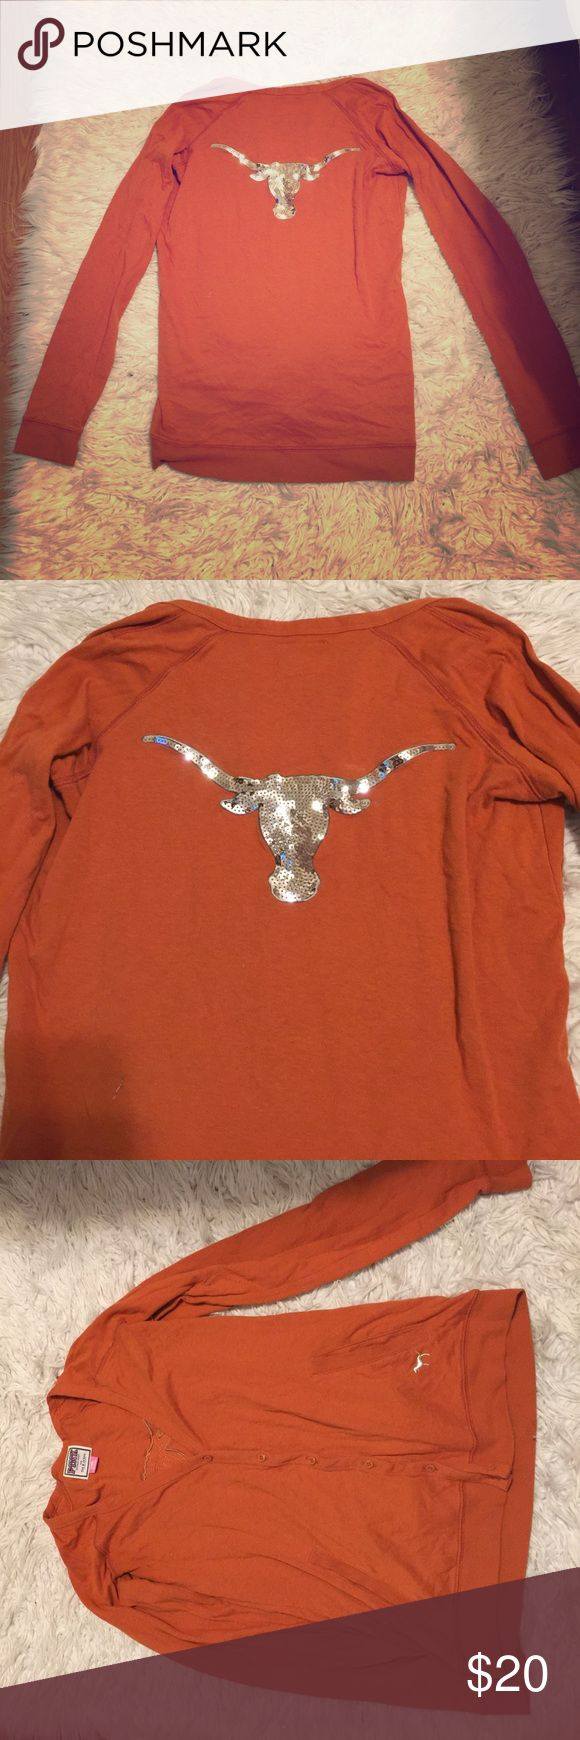 NWOT Pink UT longhorns cardigan Selling my Pink collegiate collection UT Texas longhorns cardigan. Never worn, amazing condition. PINK Tops Sweatshirts & Hoodies